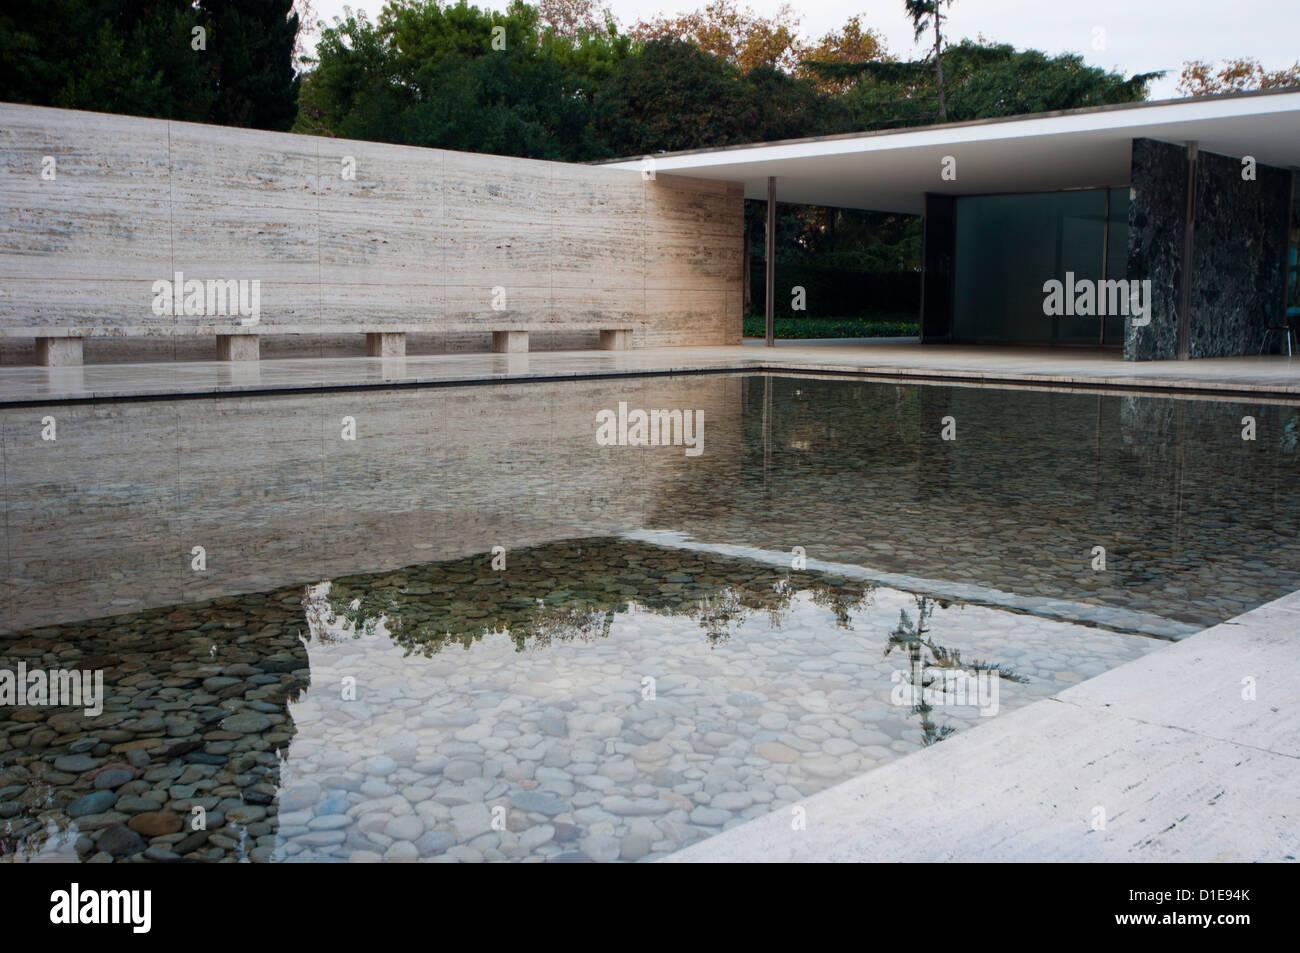 Rekonstruktion des deutschen Pavillon Van Der Rohe Barcelona Ausstellung, Barcelona, Catalunya (Katalonien), Spanien Stockbild